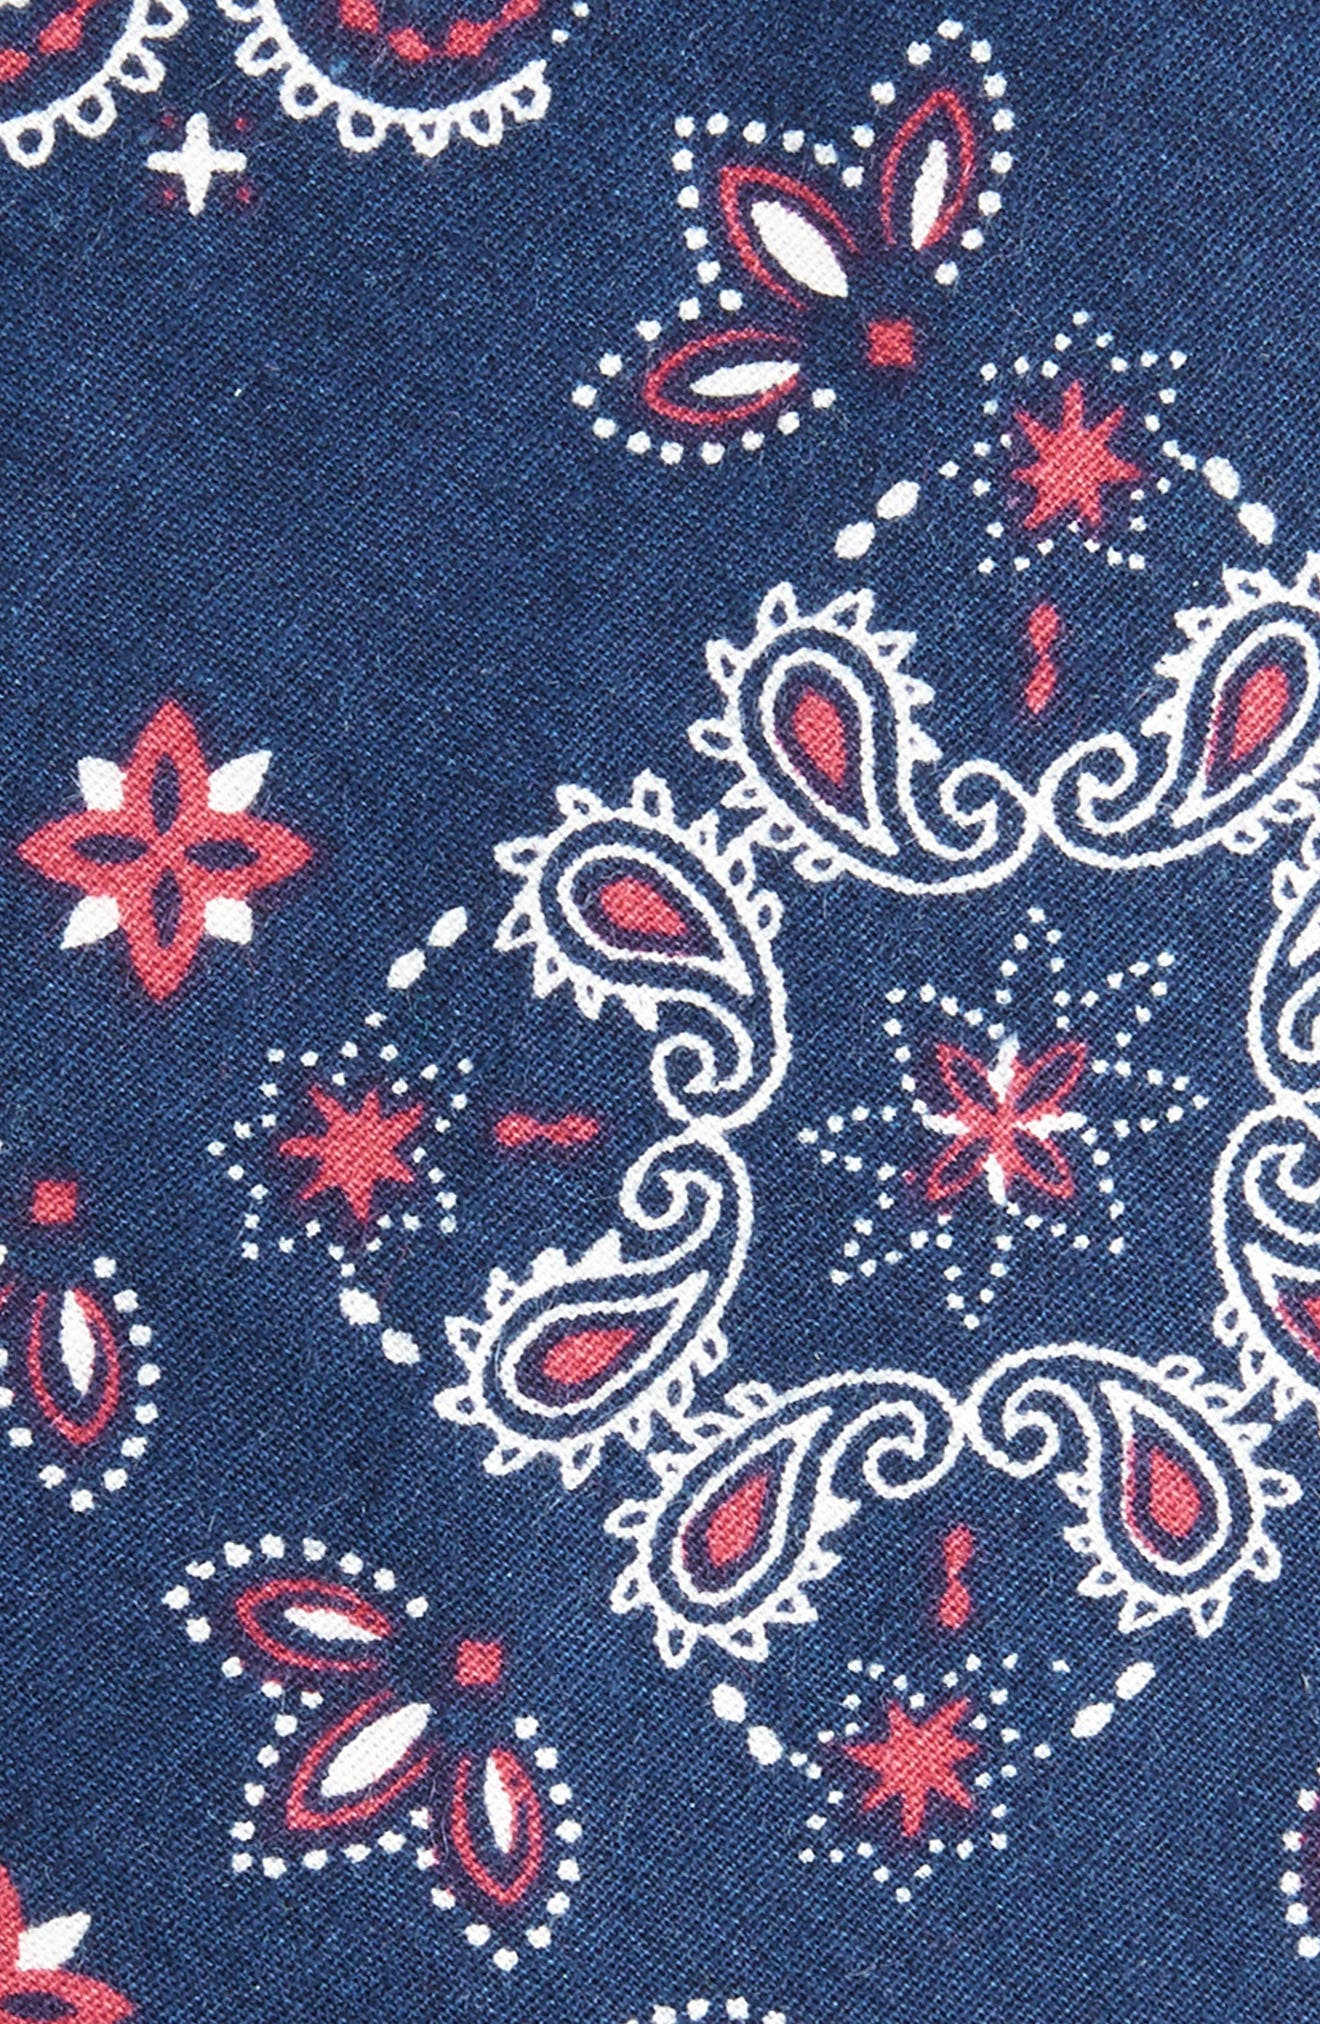 Leblanc Paisley Cotton Skinny Tie,                             Alternate thumbnail 2, color,                             410